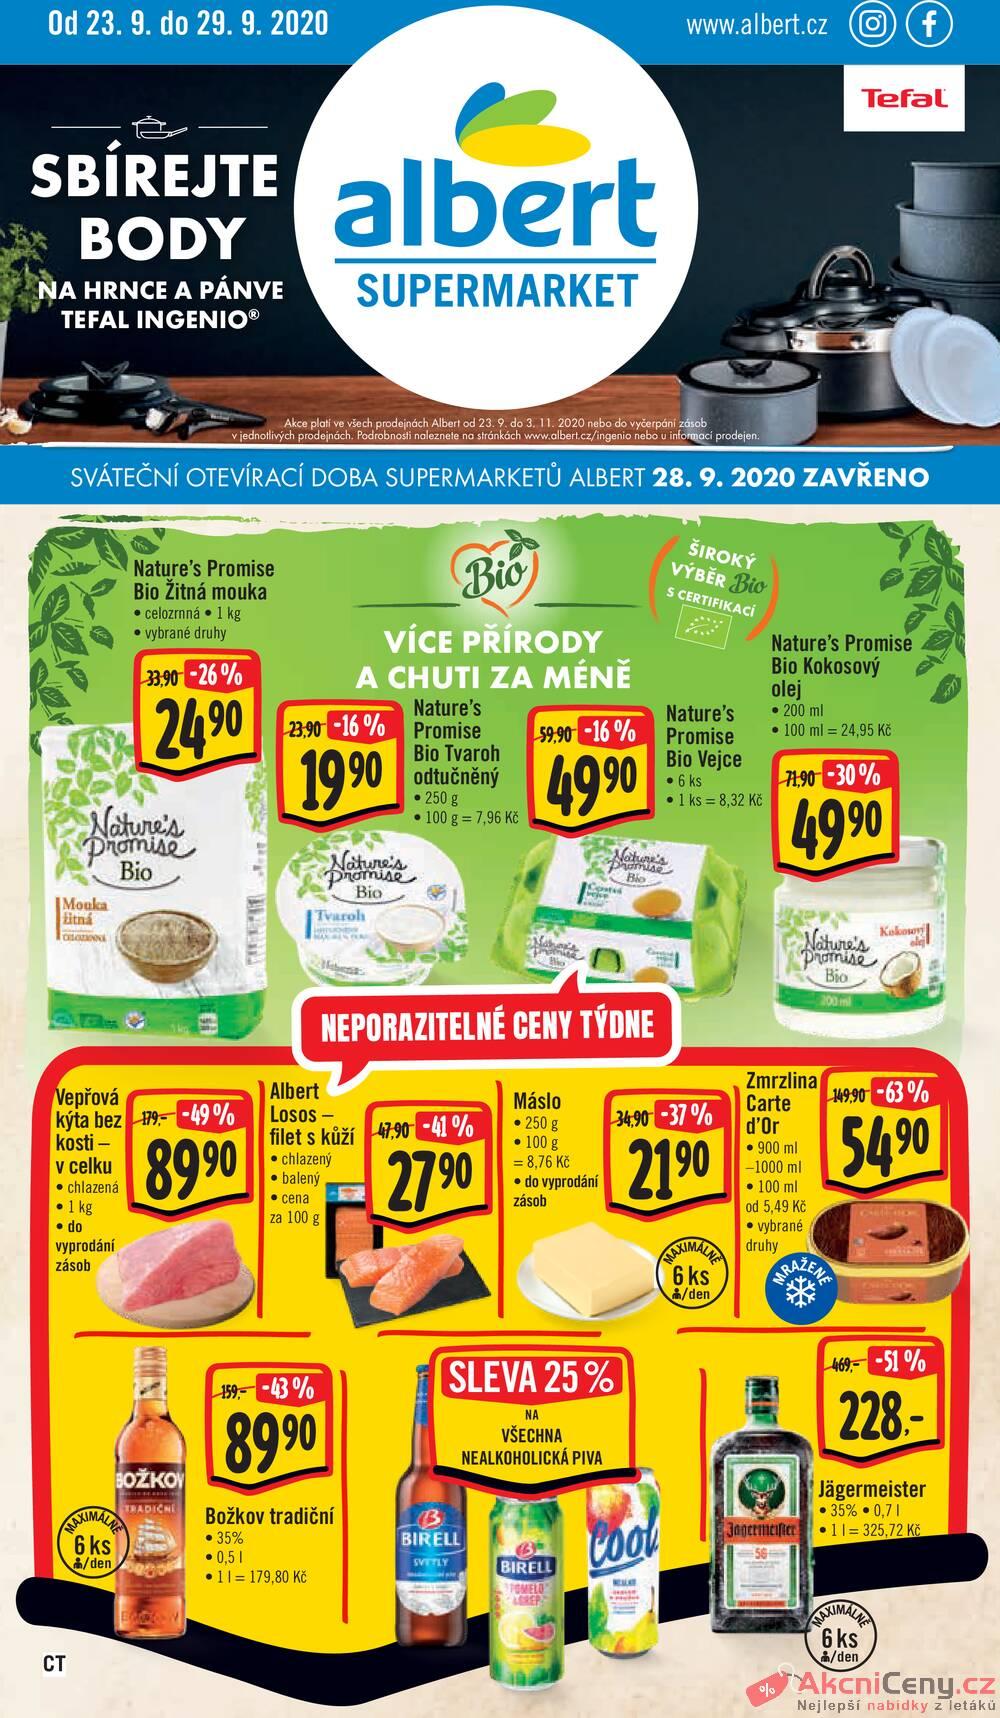 Albert Supermarket CITY od 23.9. do 29.9.2020